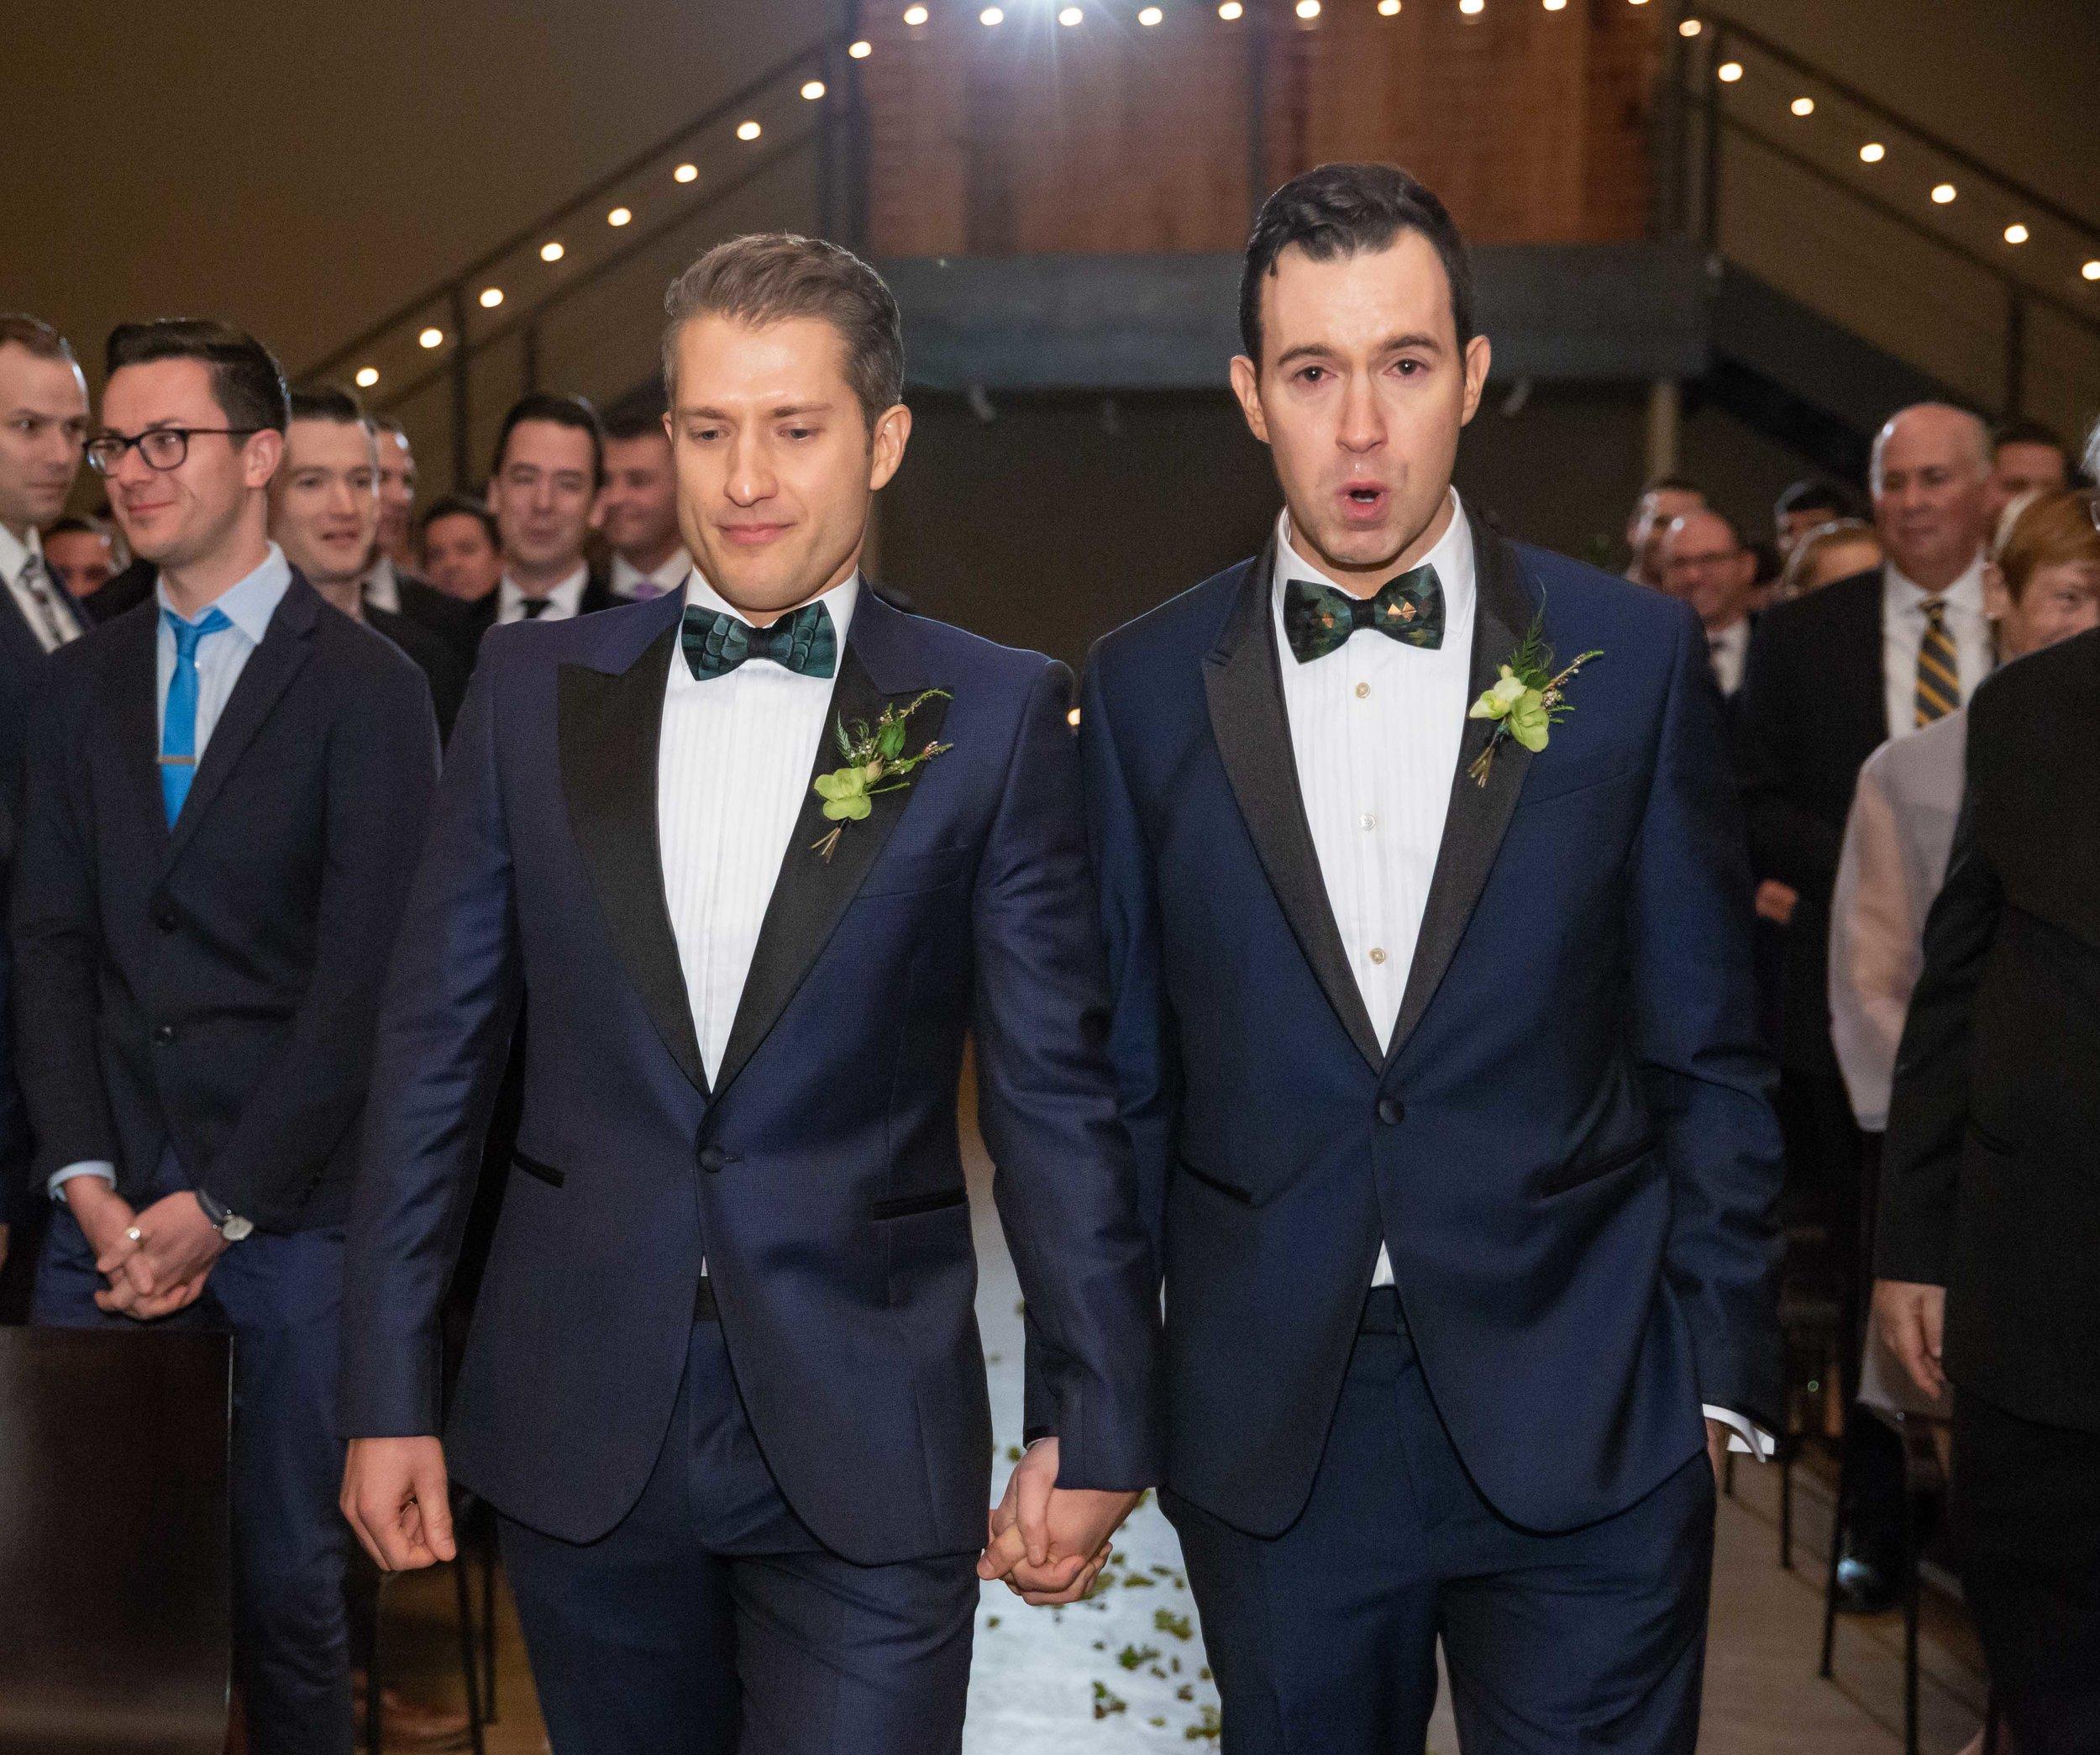 The Roundhouse Wedding - Beacon, NY - Douglas and Jason